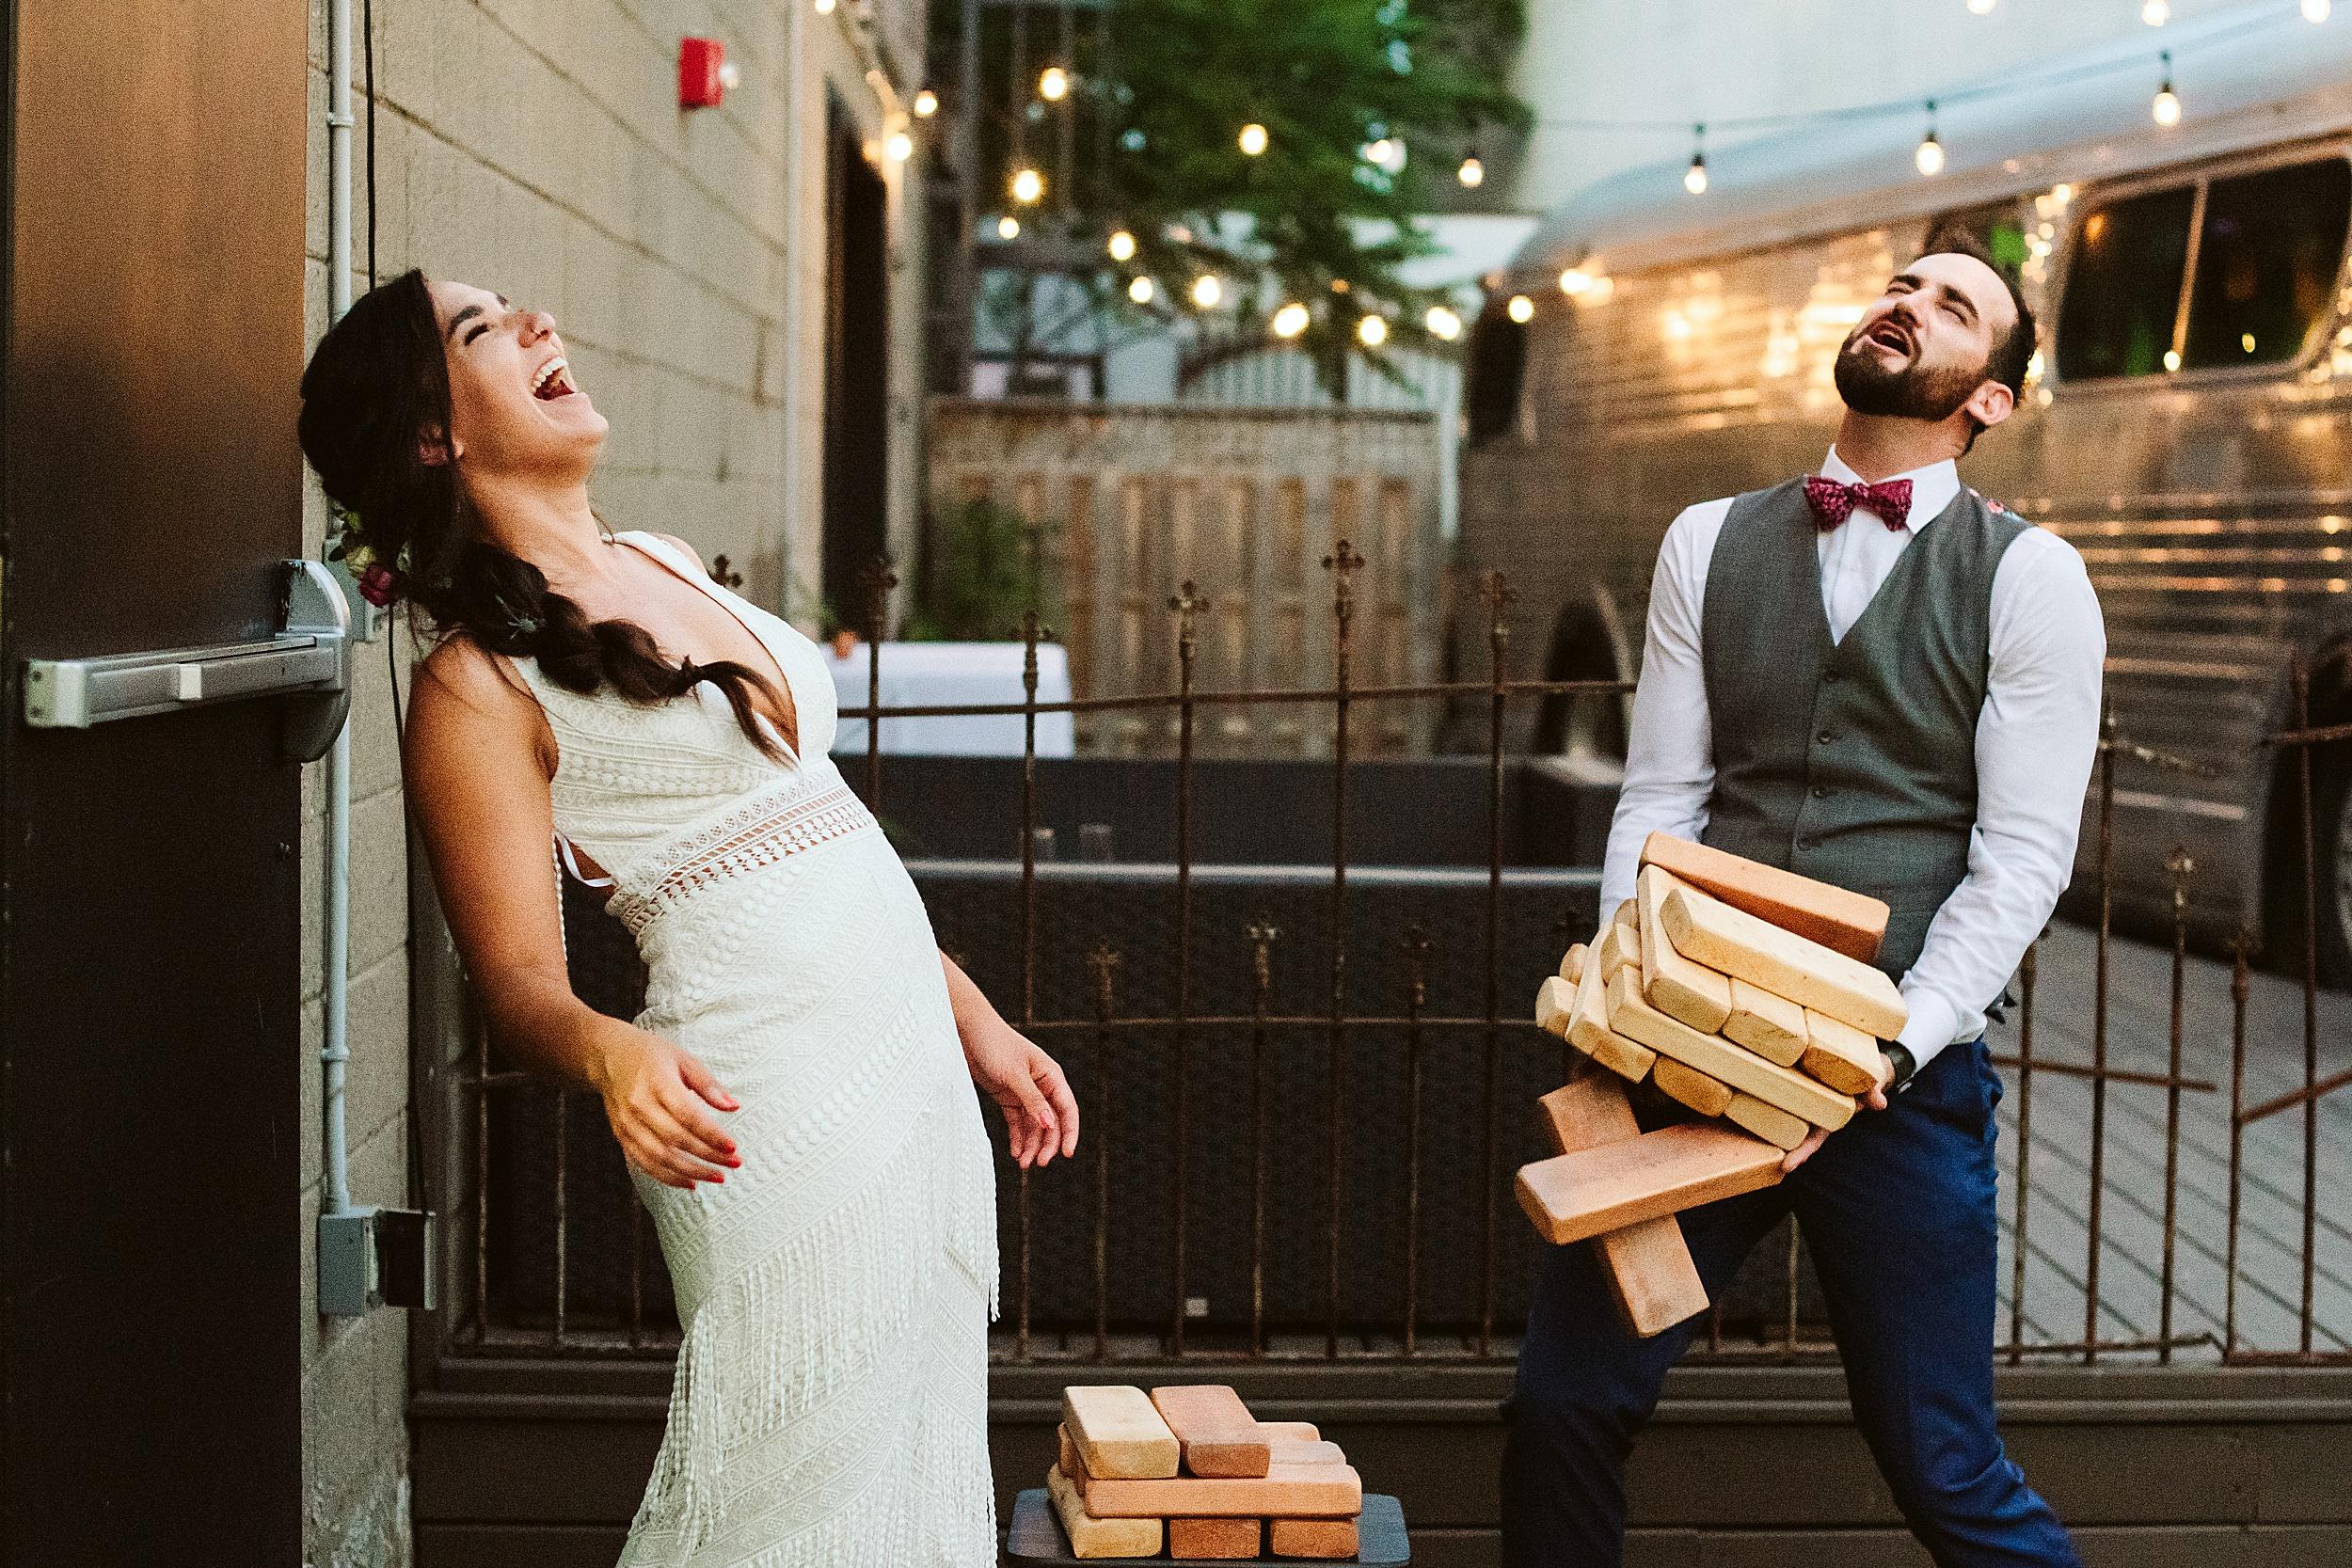 Airship-37-Berkeley-Events-Distillery-District-Wedding-Toronto-Wedding-Photographers_0054.jpg